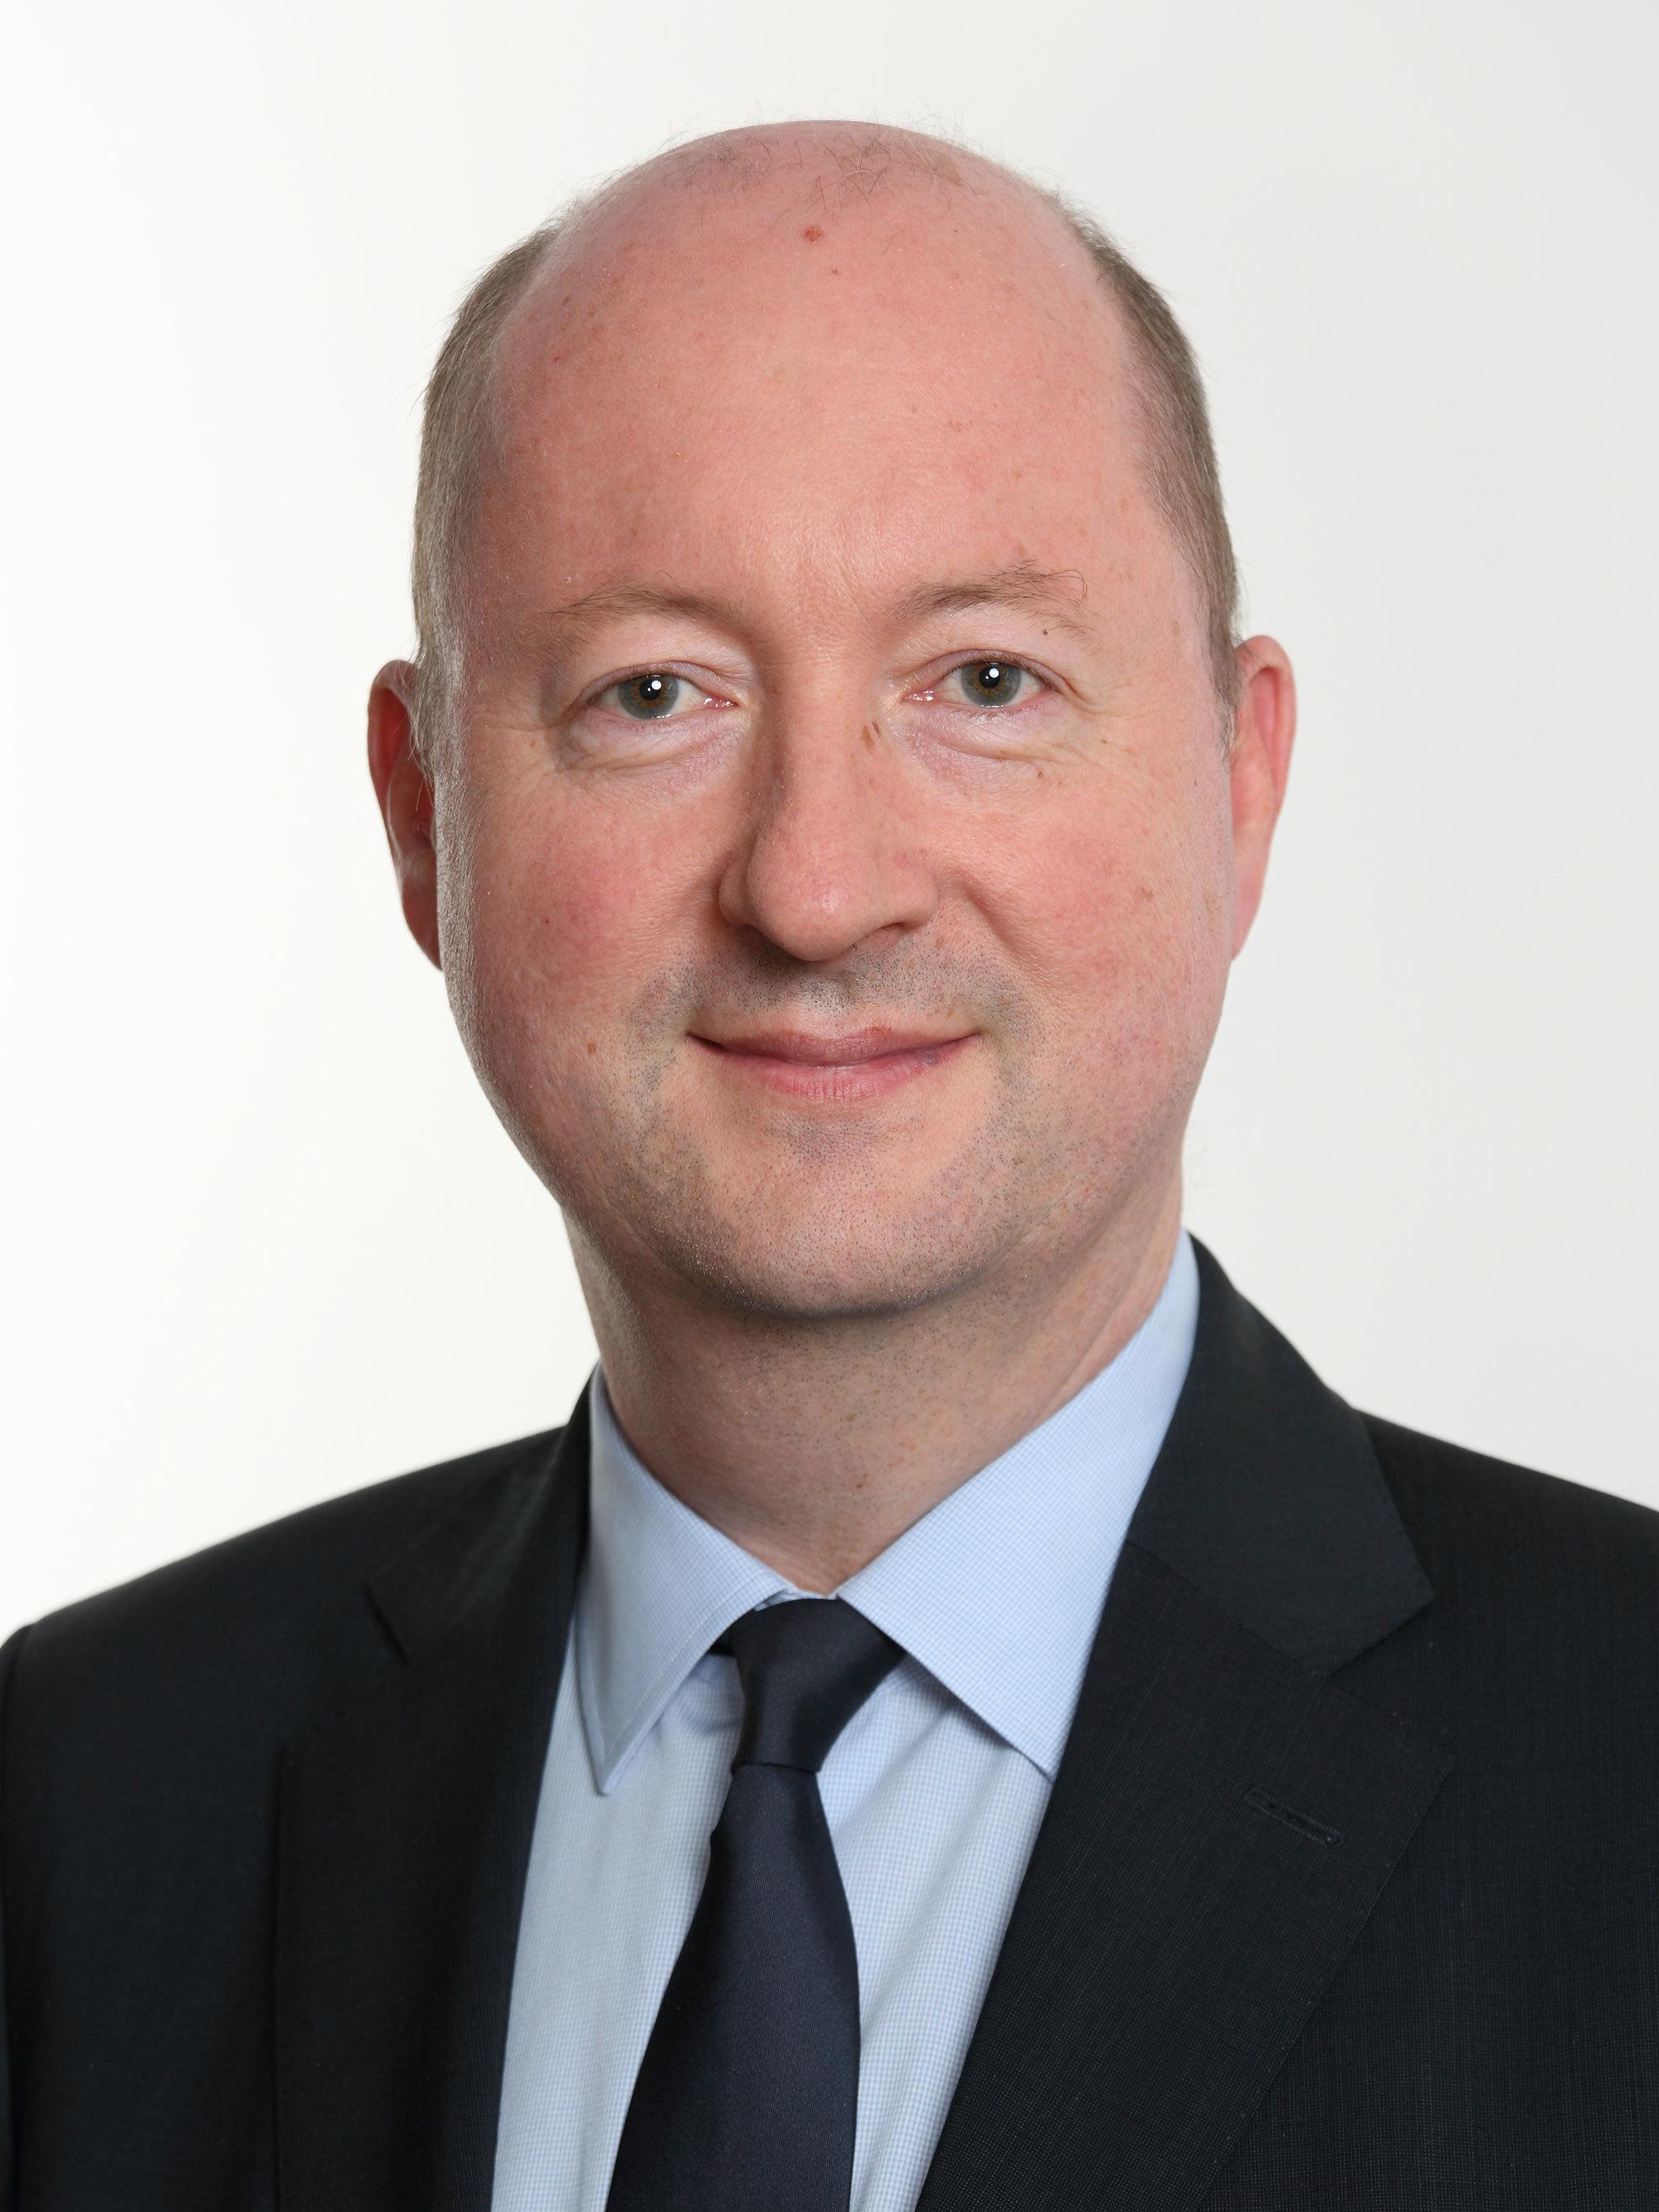 Hansjörg Patzschke